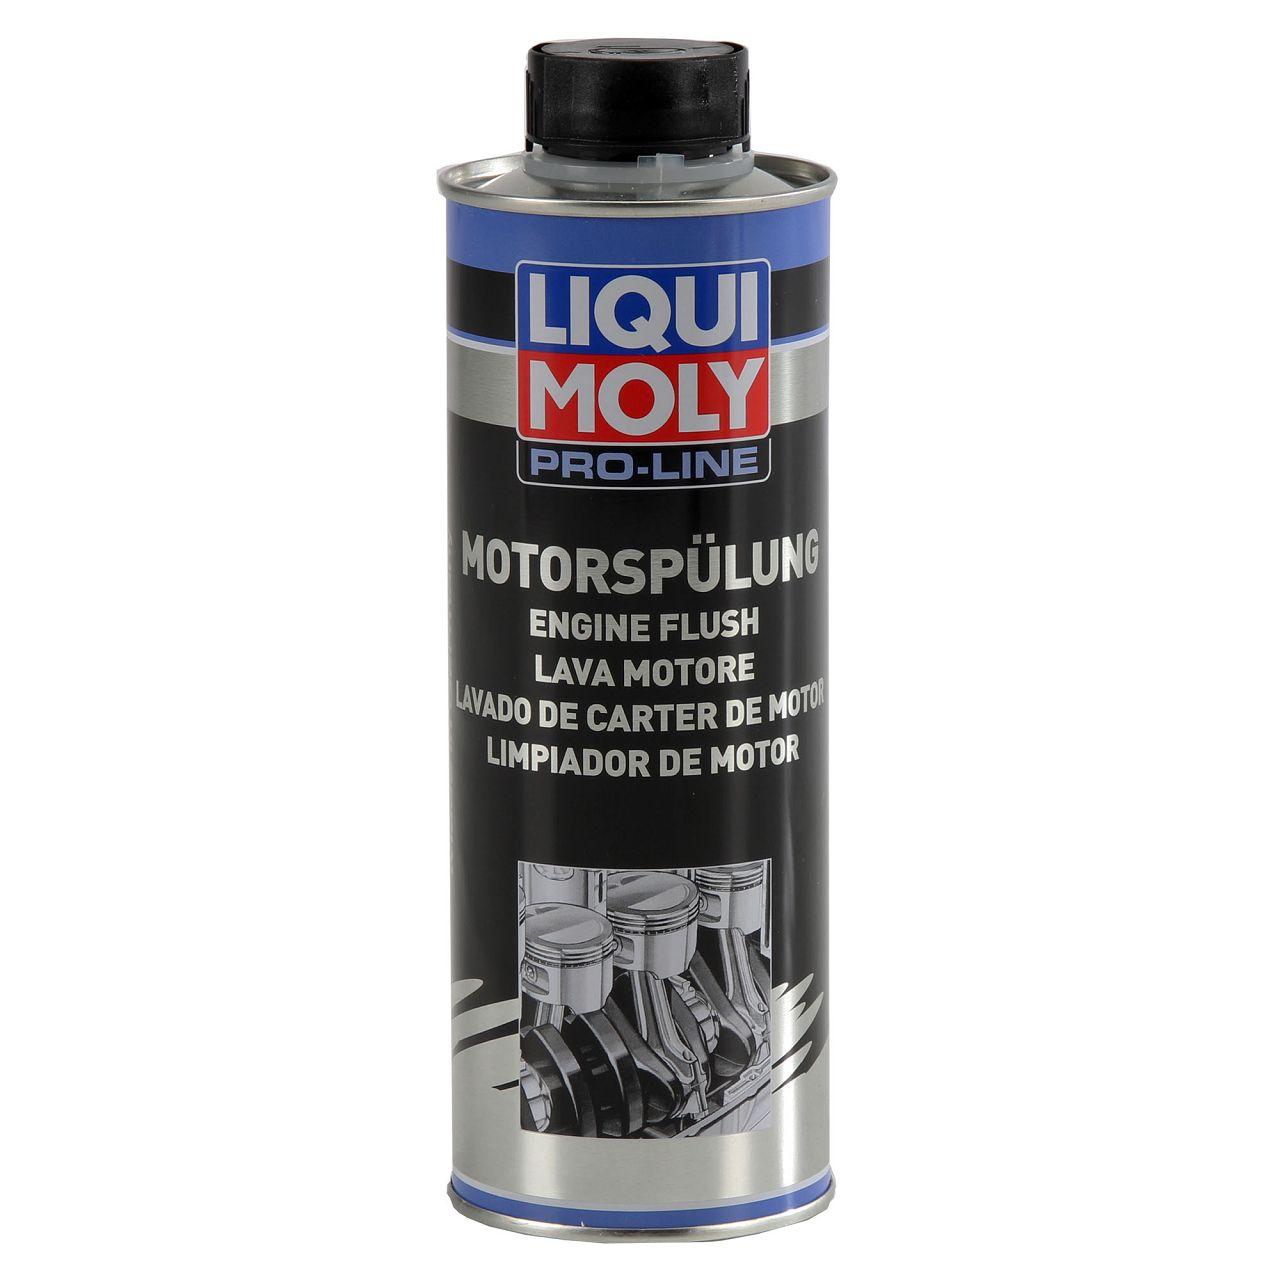 LIQUI MOLY 2427 PRO-LINE Motorspülung Motorreinigung Schlammspülung 500 ml